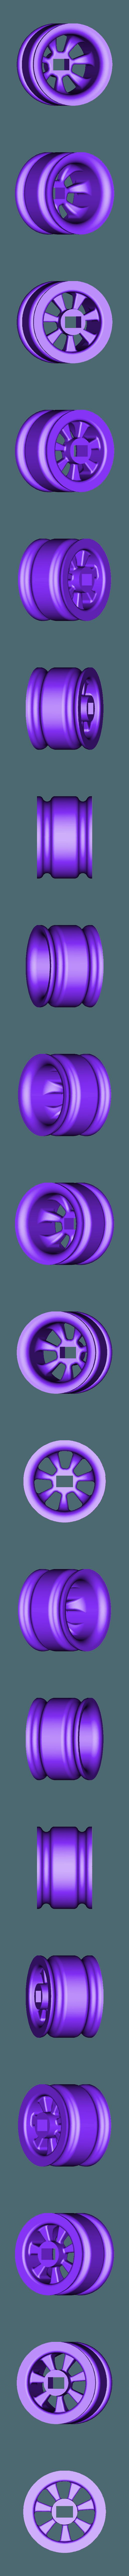 rim_0mm_offset.stl Download free STL file Orlandoo Hunter crawler wider rims • 3D printing model, VICLER